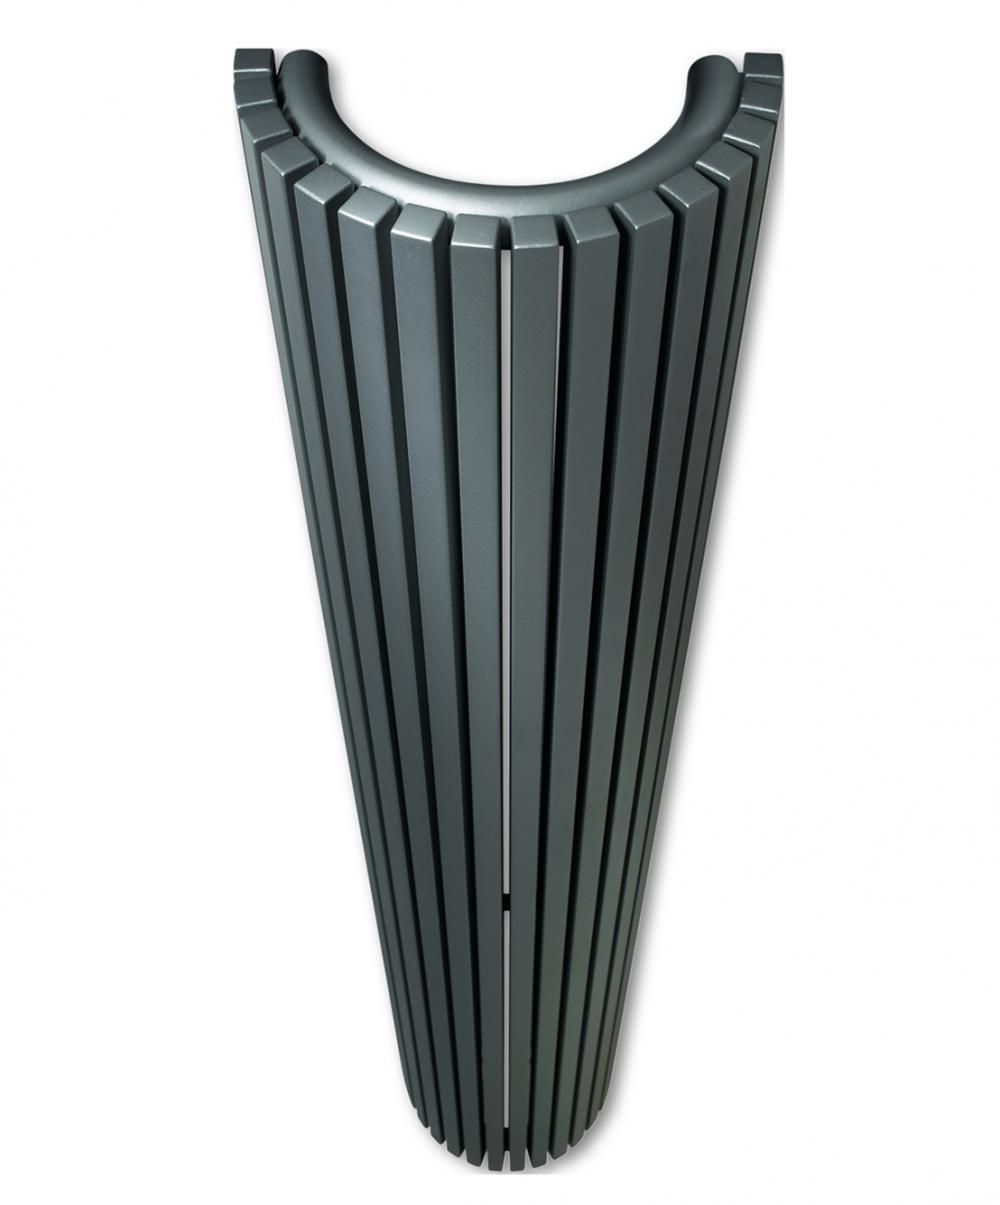 Calorifere decorative semirotunde Vasco Carre CR-O 1800x430 mm, 1981 W